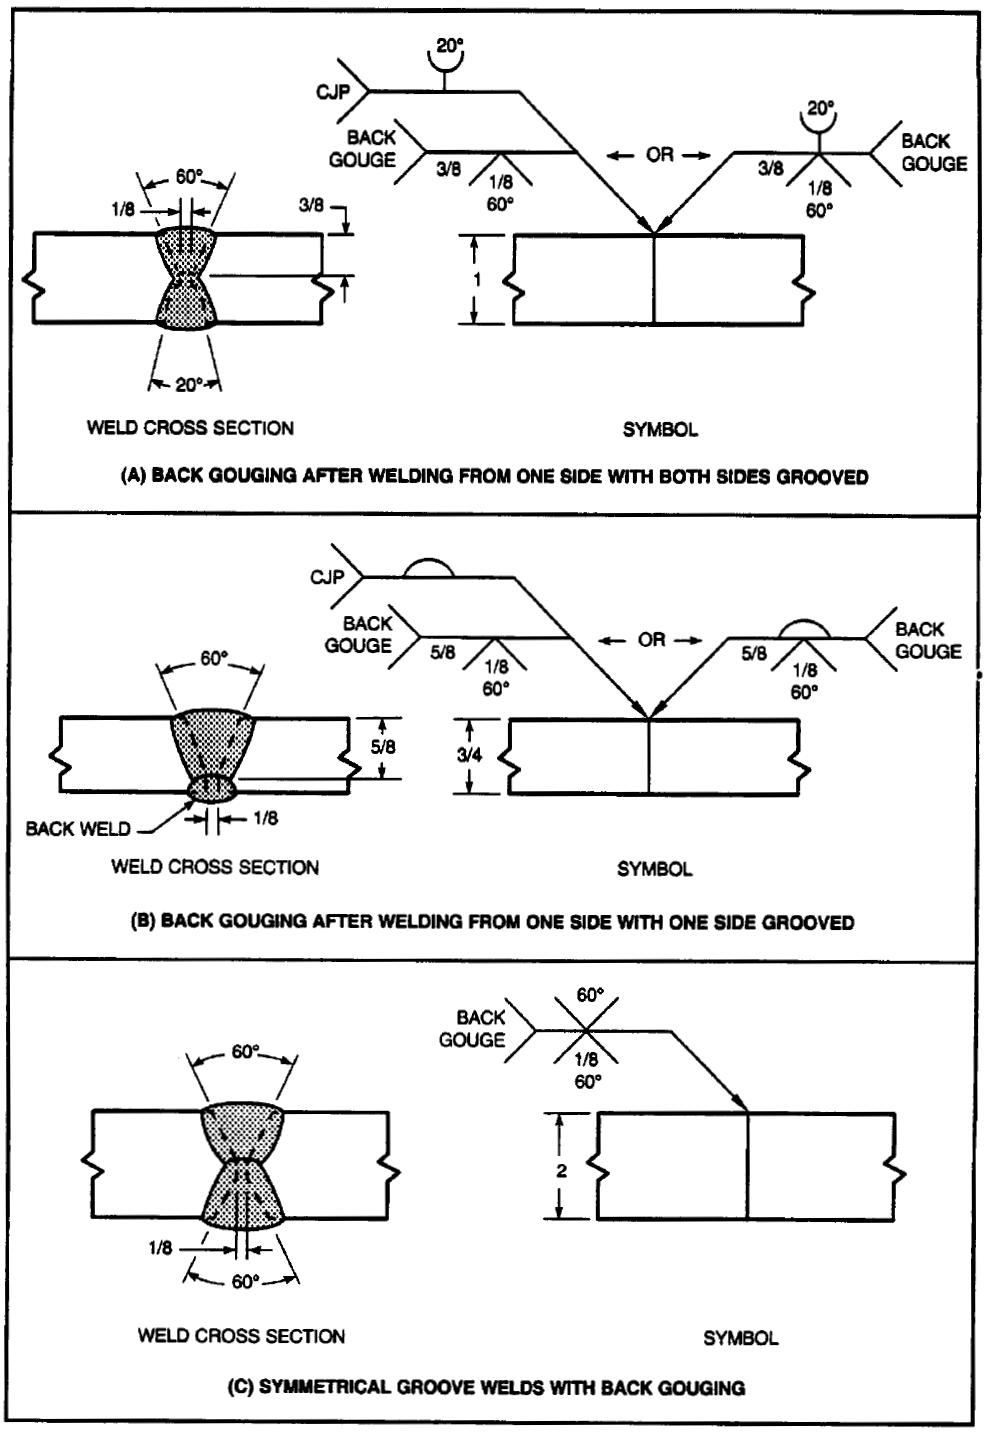 Welding Diagram Symbols Wiring Database Tig Line Distinction Between Weld Symbol And Weldknowledge Index Arc Welder